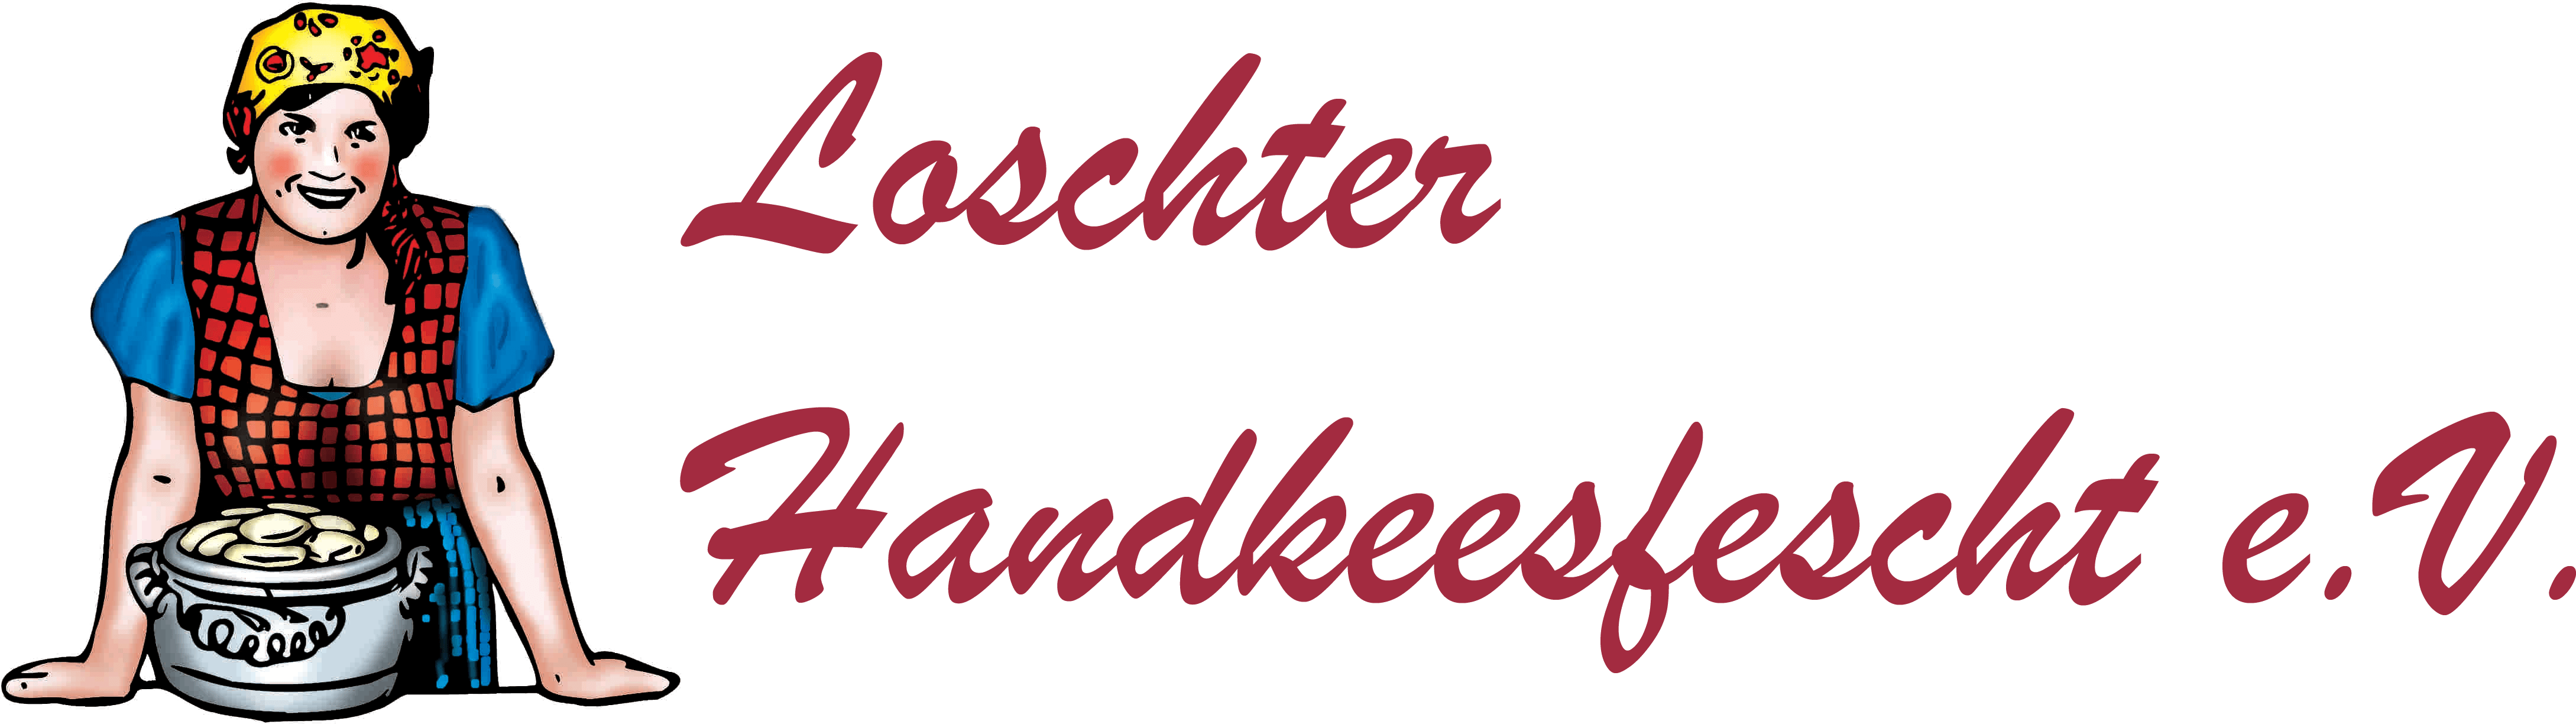 Logo Handkeesfescht